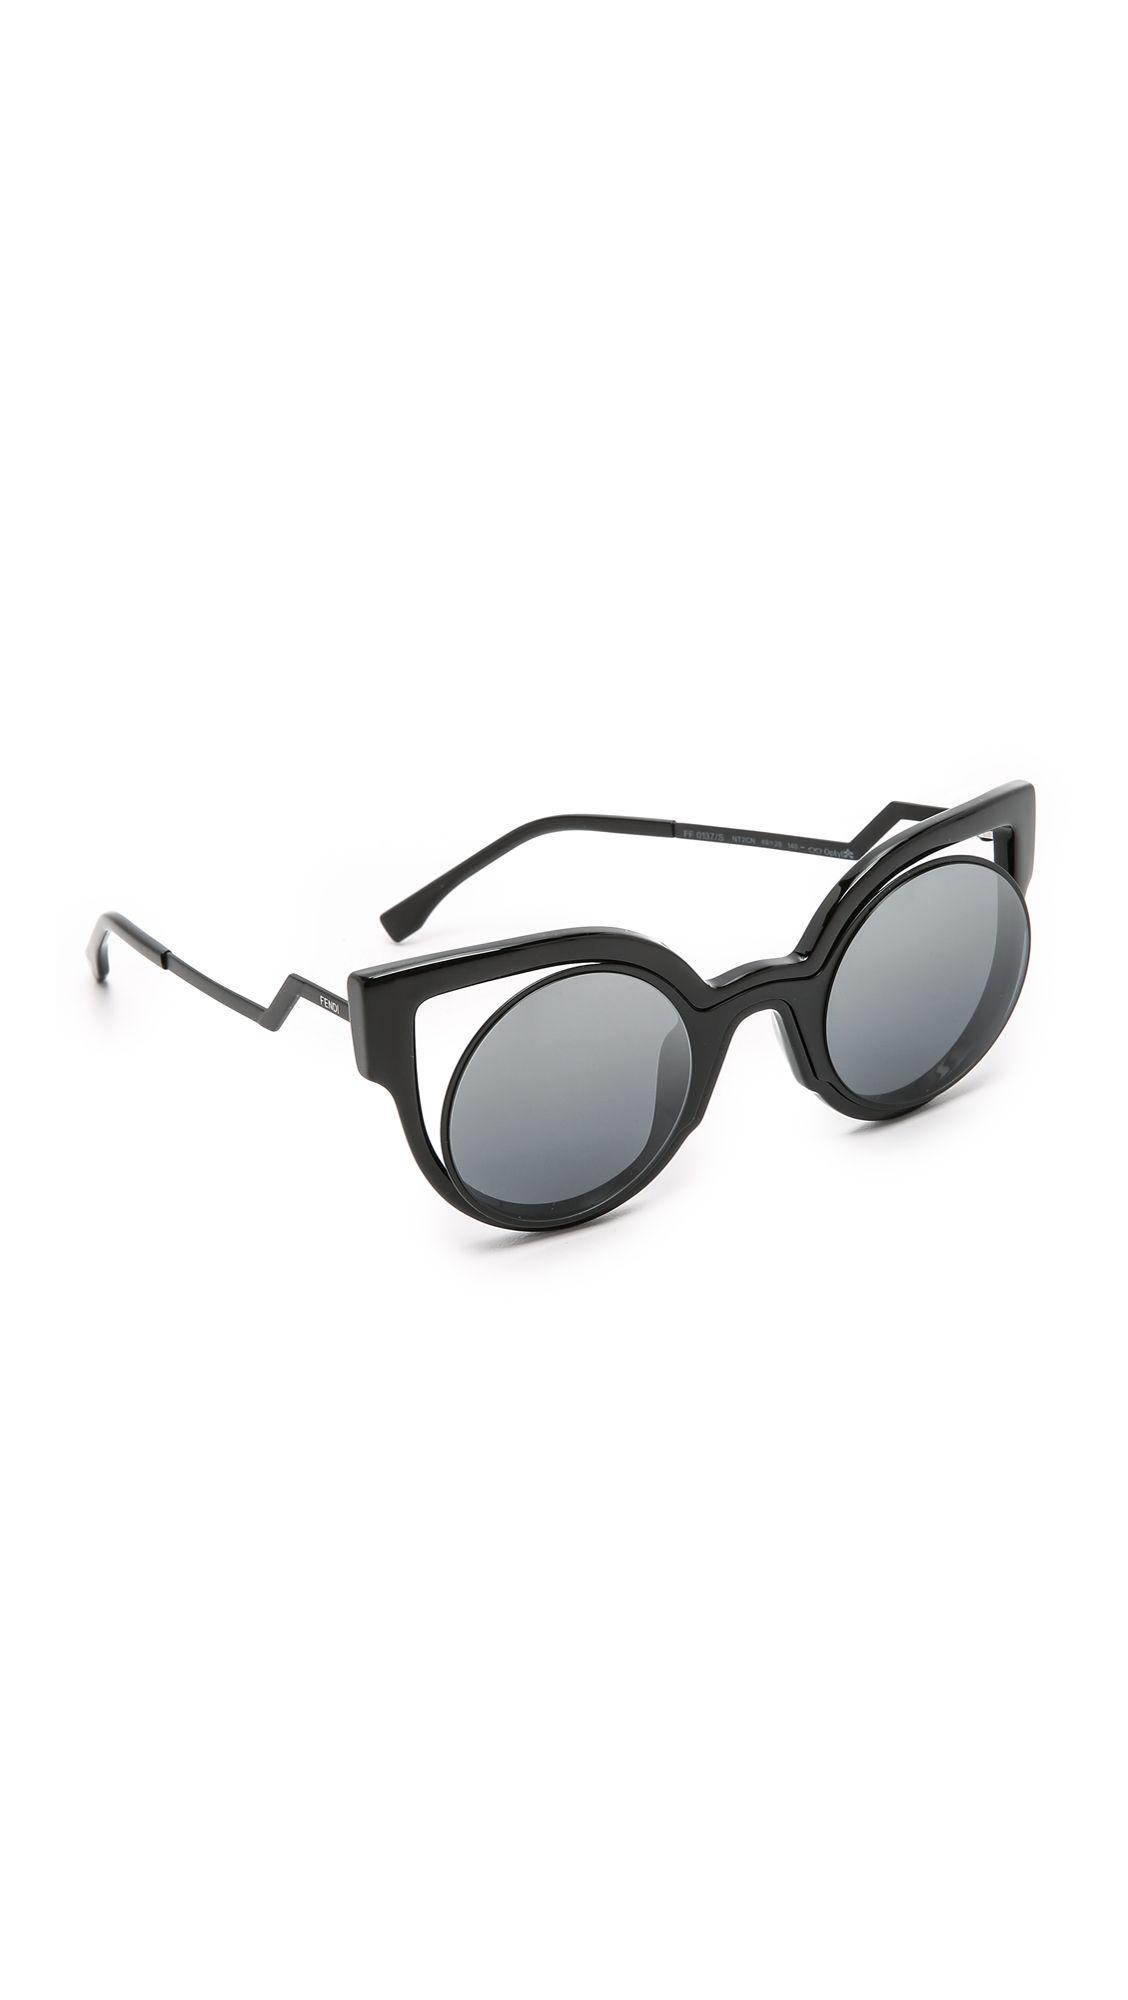 43bebc834f968 Fendi Round Cutout Sunglasses - Matte Shiny Black Dark Grey ...